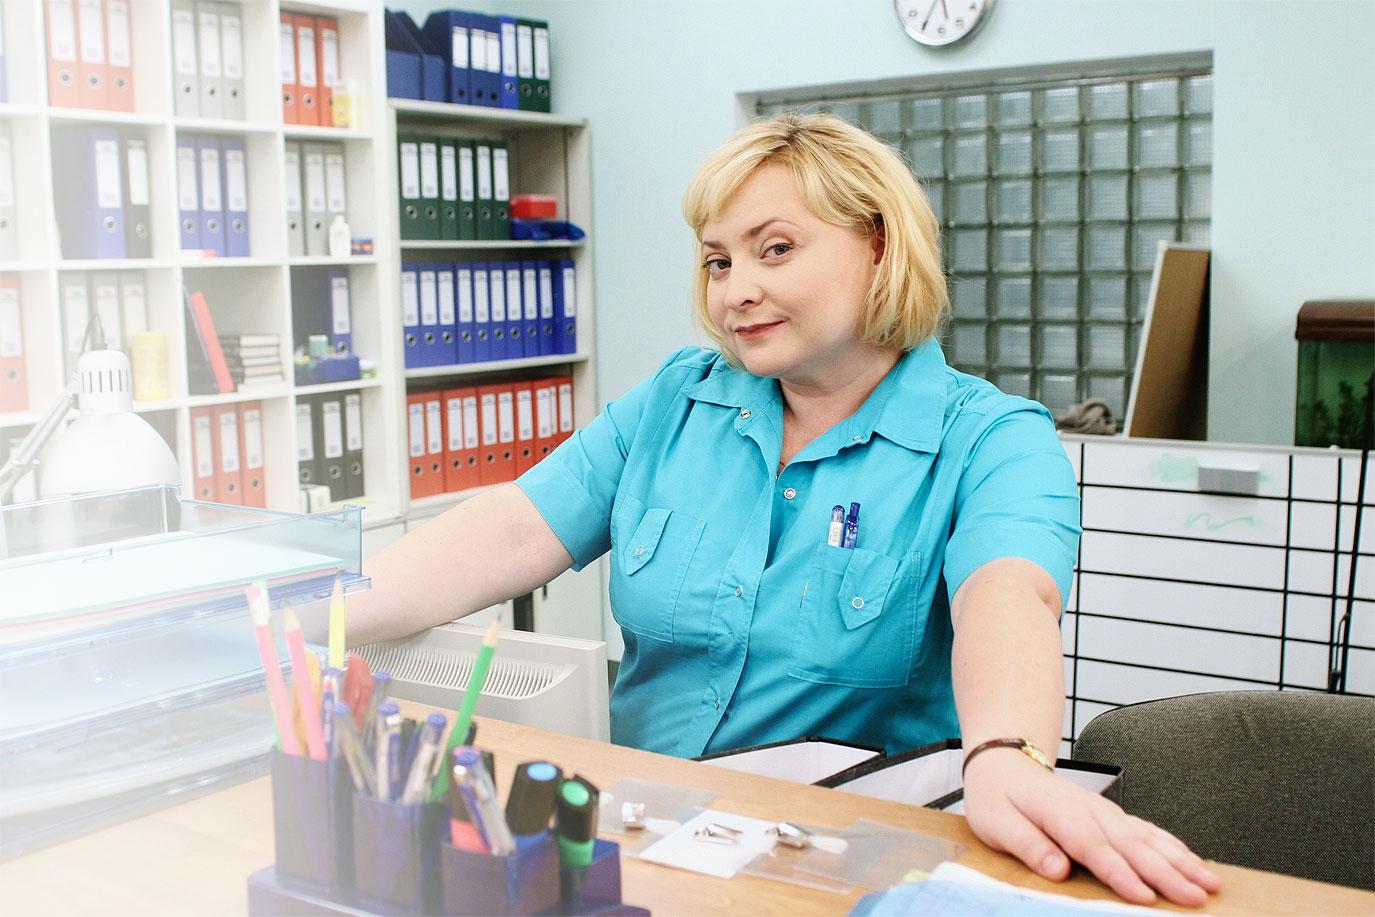 Светлана Пермякова - фото №3